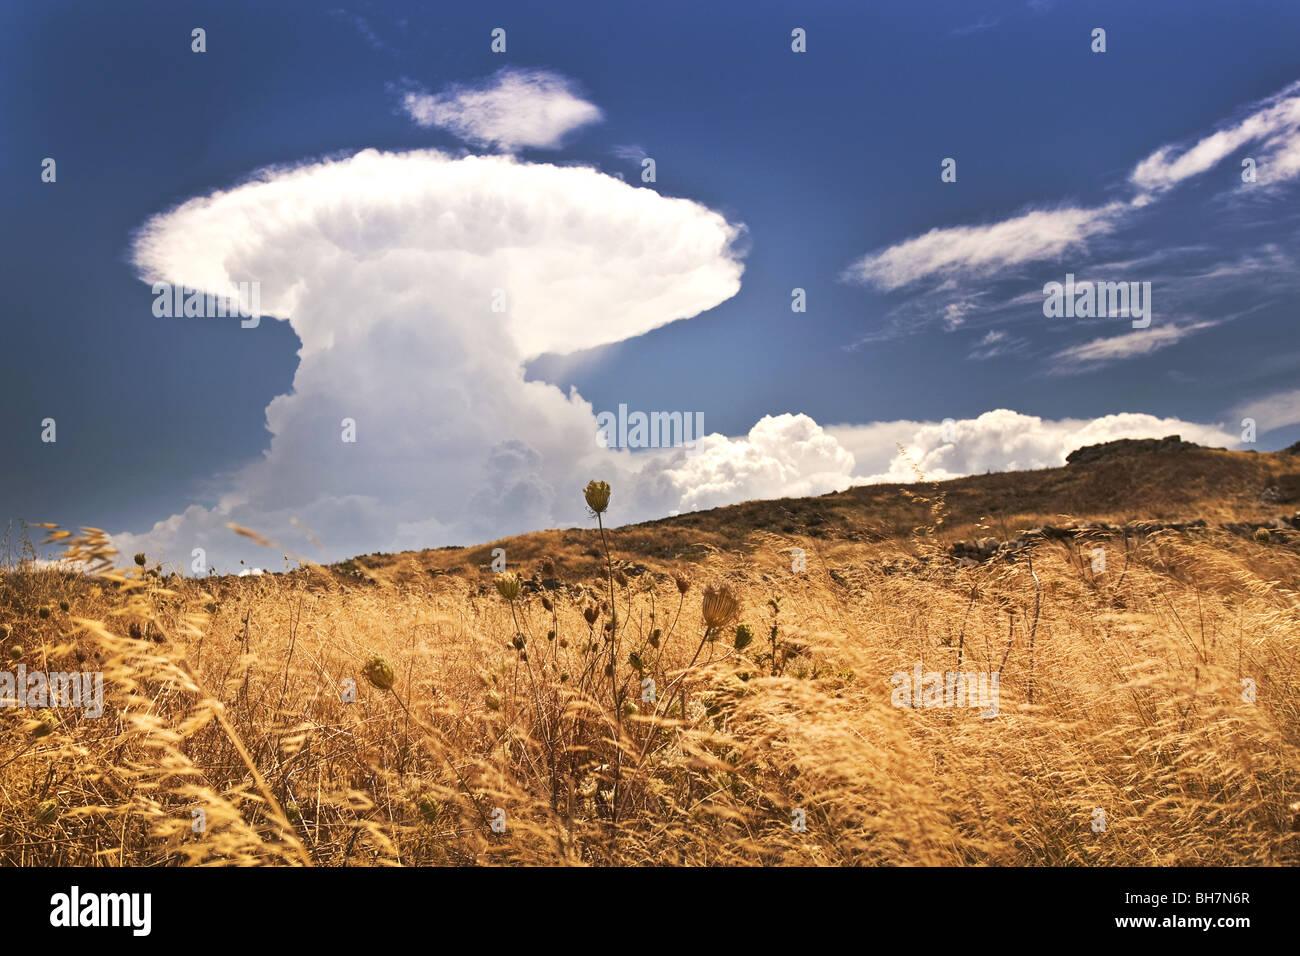 Pyrocumulus nuclear-like mushroom cloud, Delos, Greece. - Stock Image